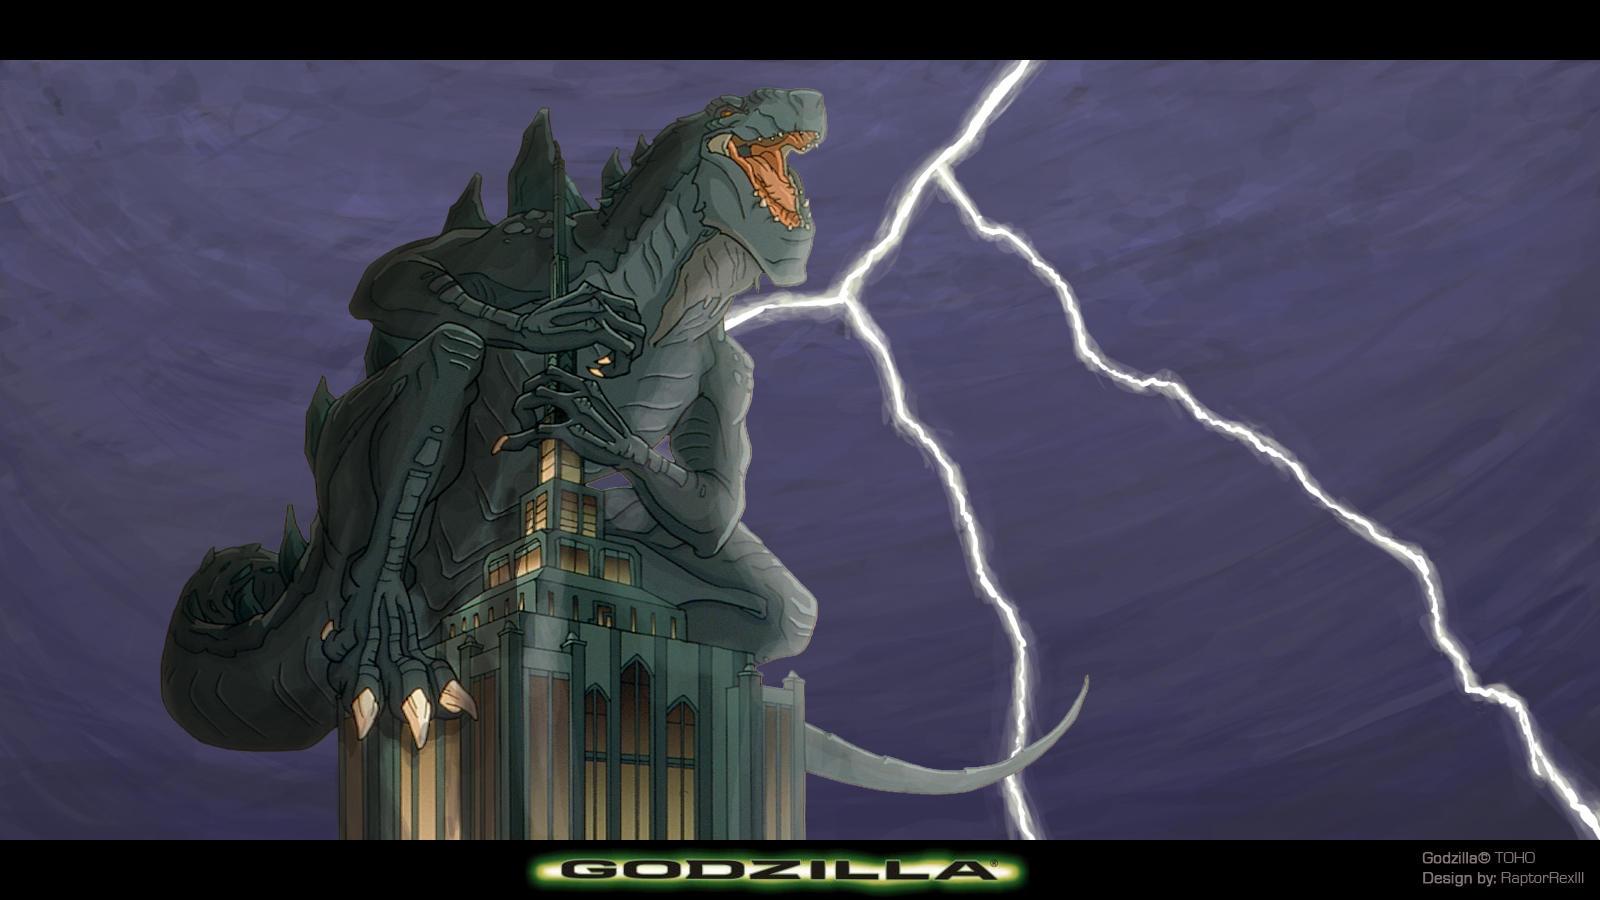 Godzilla 1998 Wallpaper By RaptorRexIII On DeviantArt